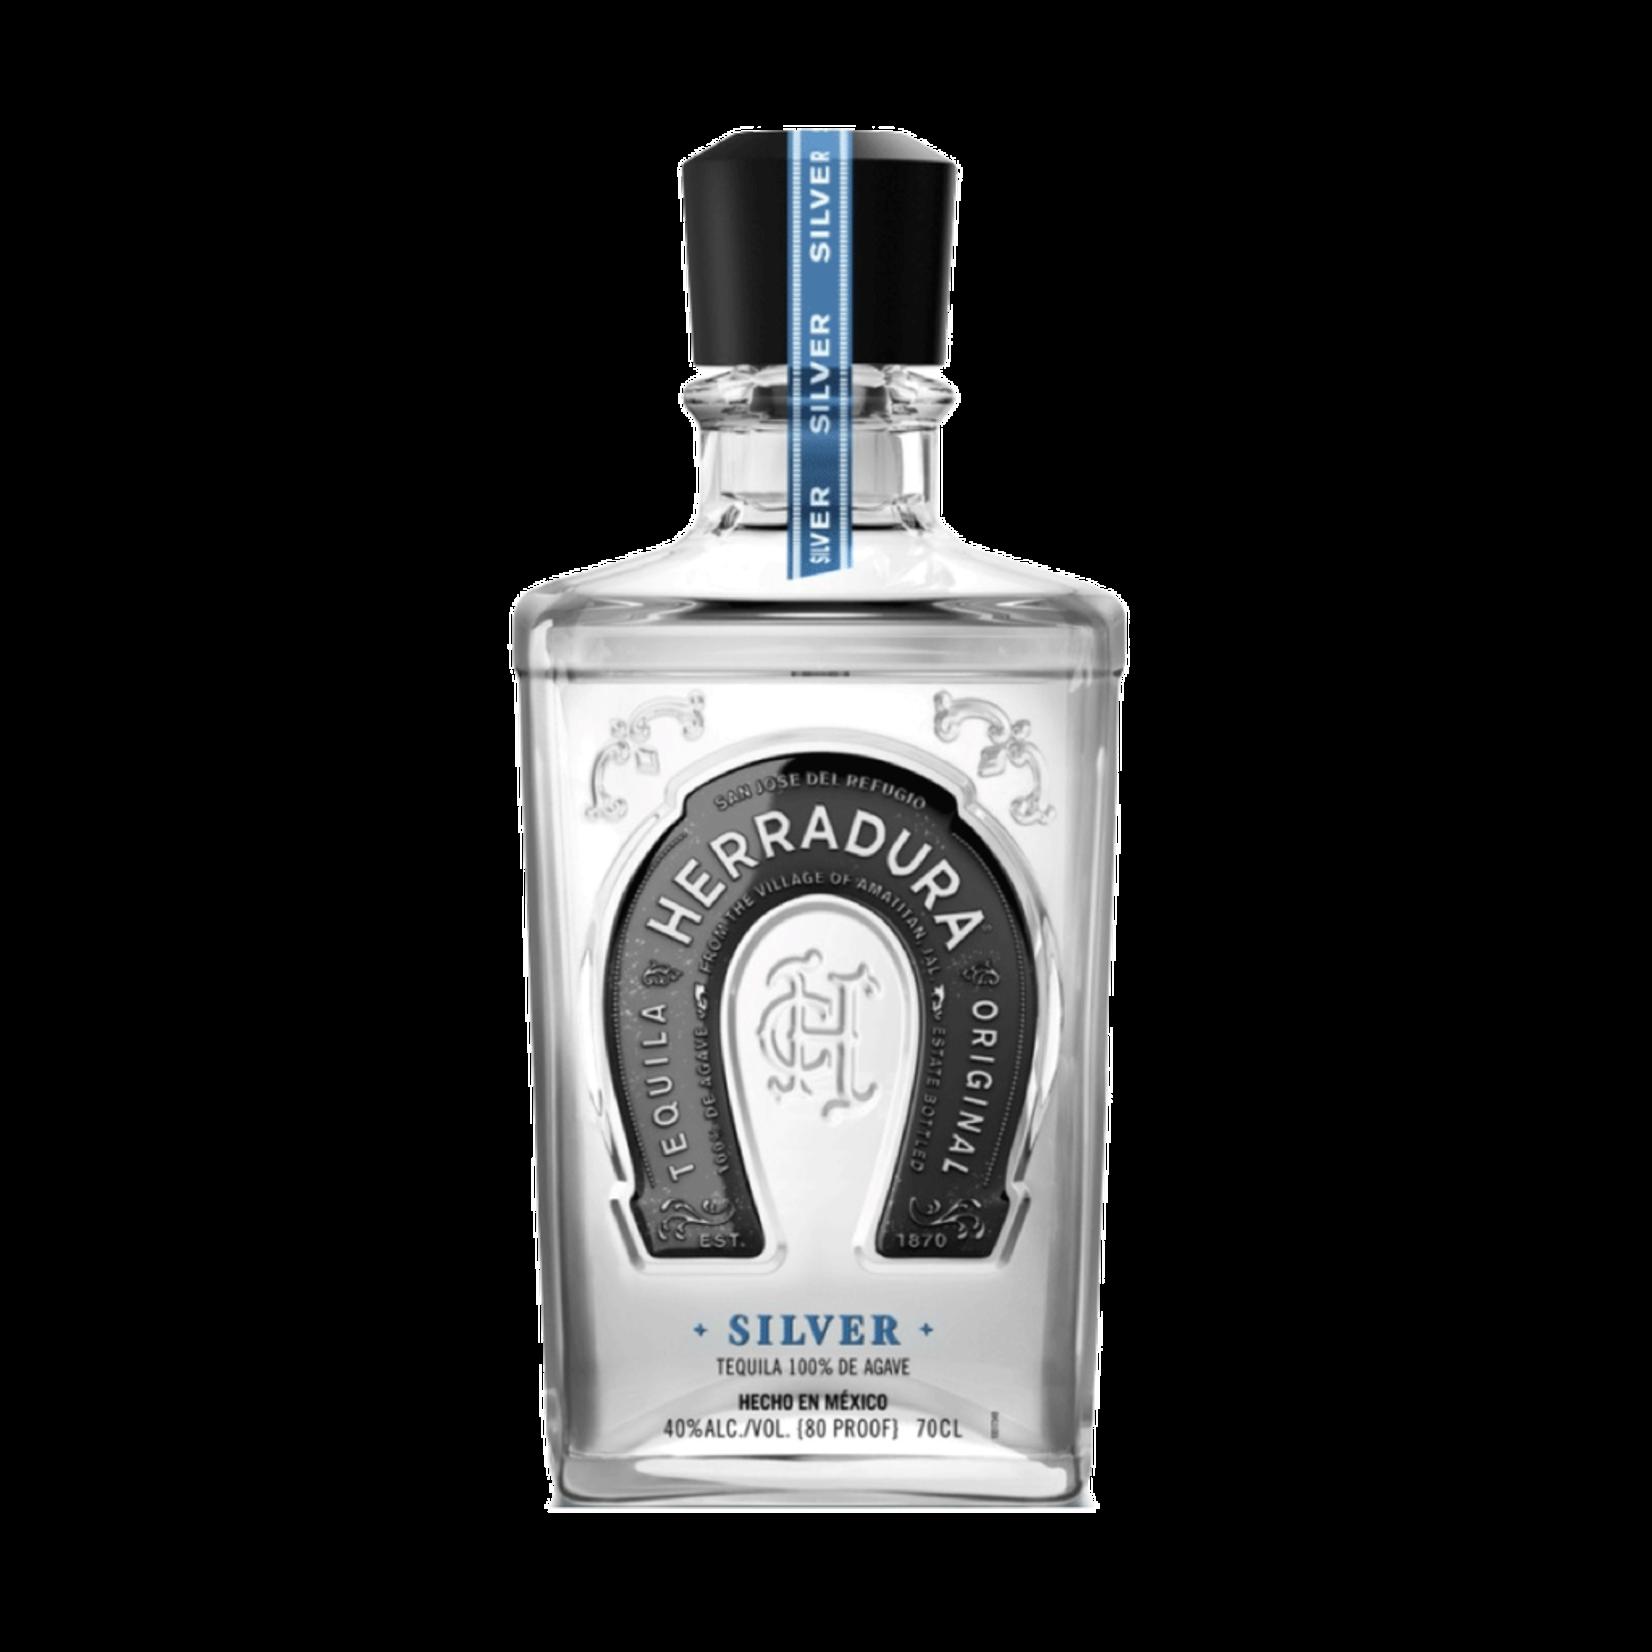 Herradura Blanco (Silver) Tequila